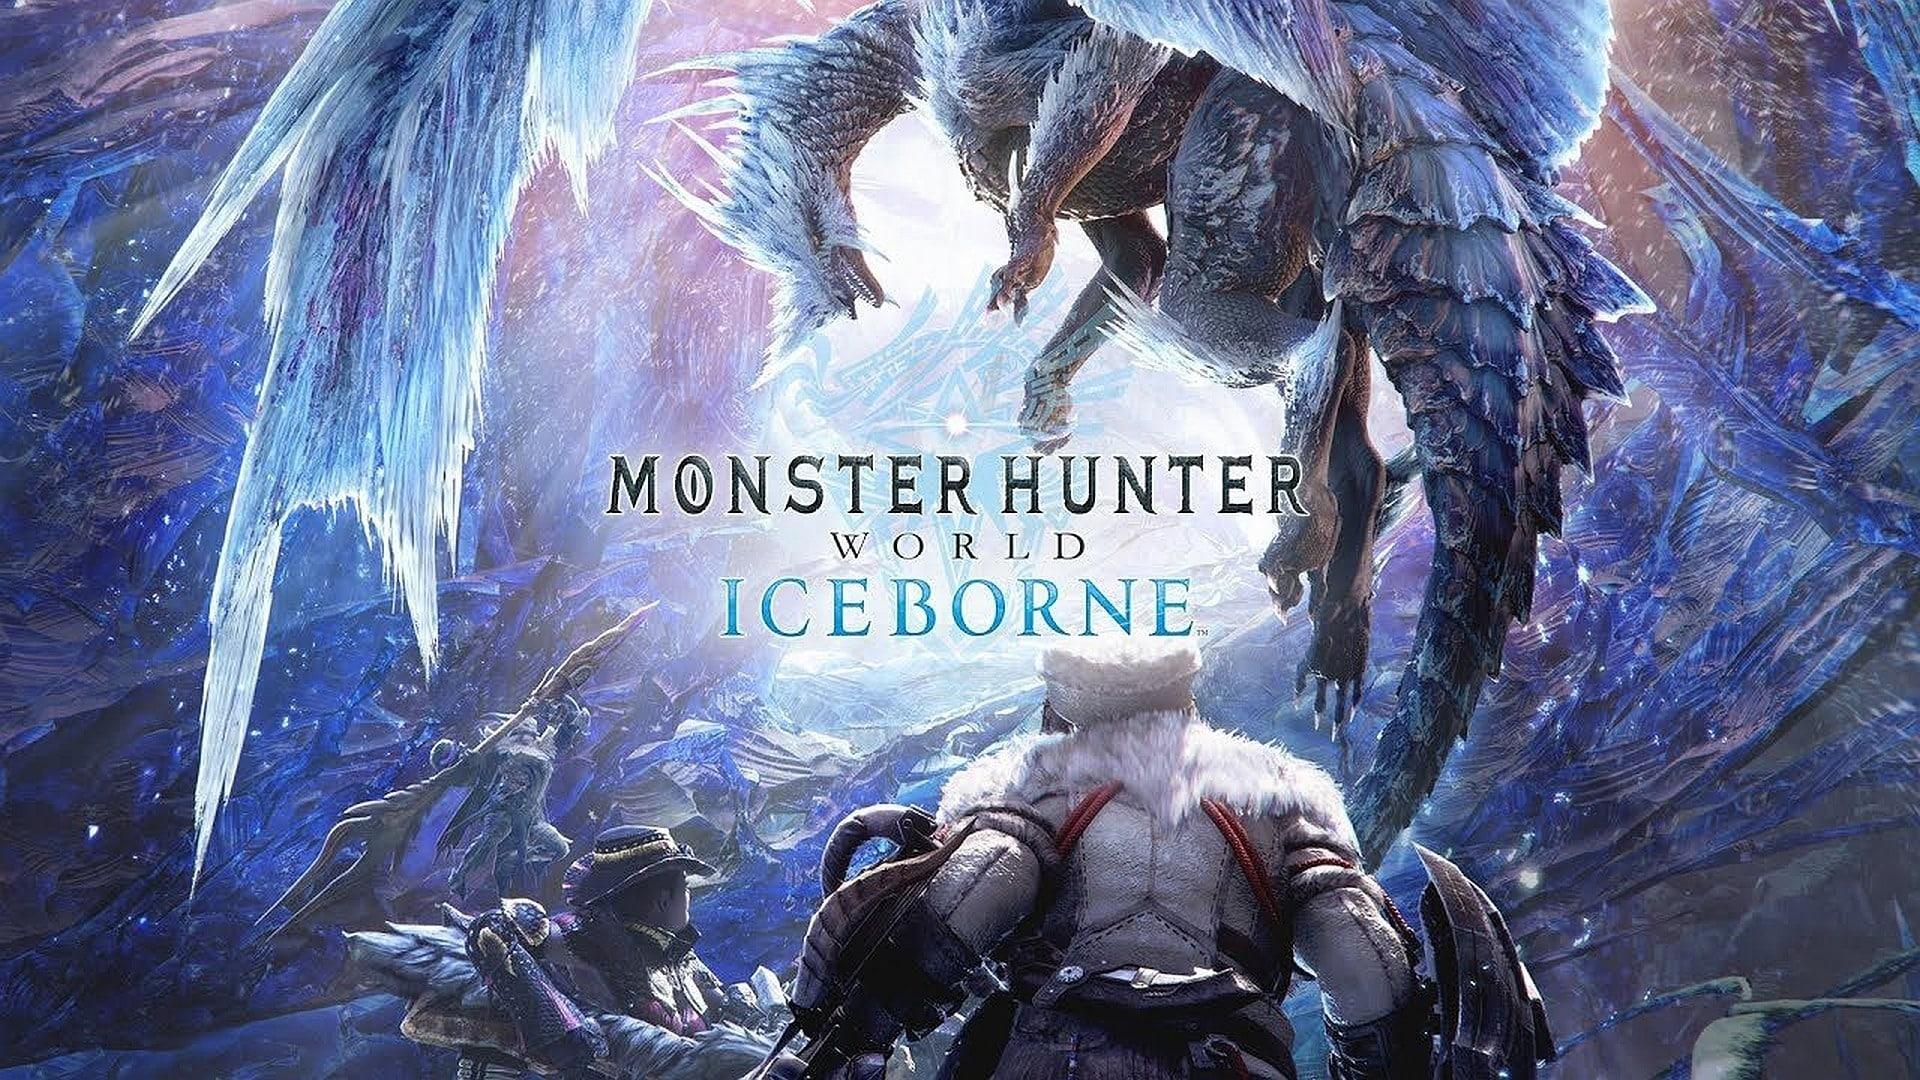 Monster Hunter World: Iceborne pc release date Iceborne PC features Capcom